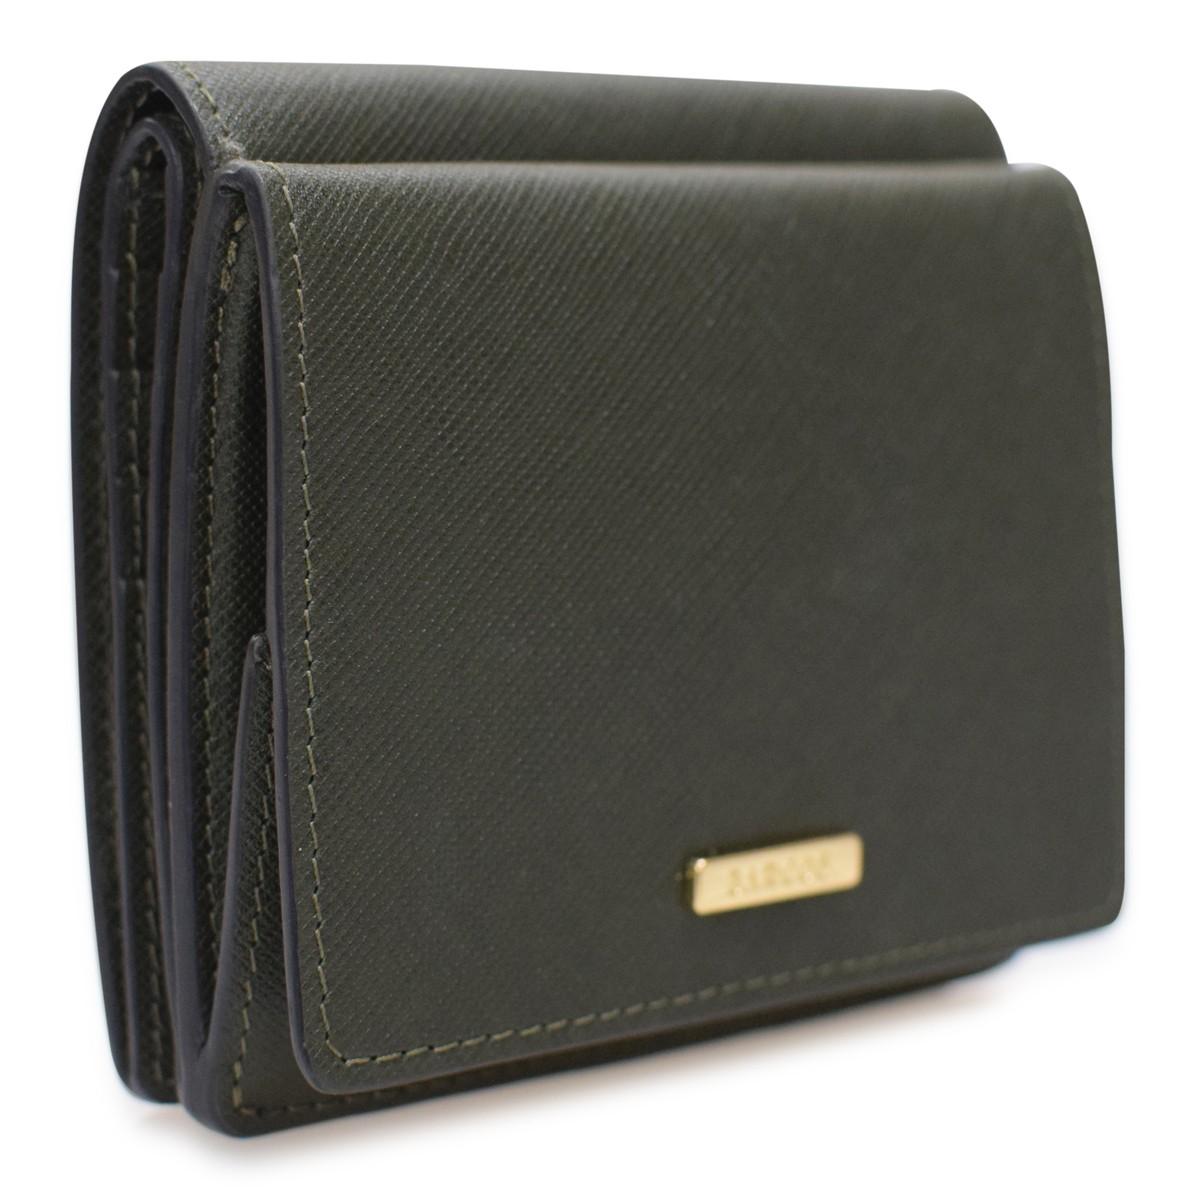 a76351195827 BARCOSBARCOSグッドラックウォレット折財布サリーレディース全1色ONESIZEバルコス